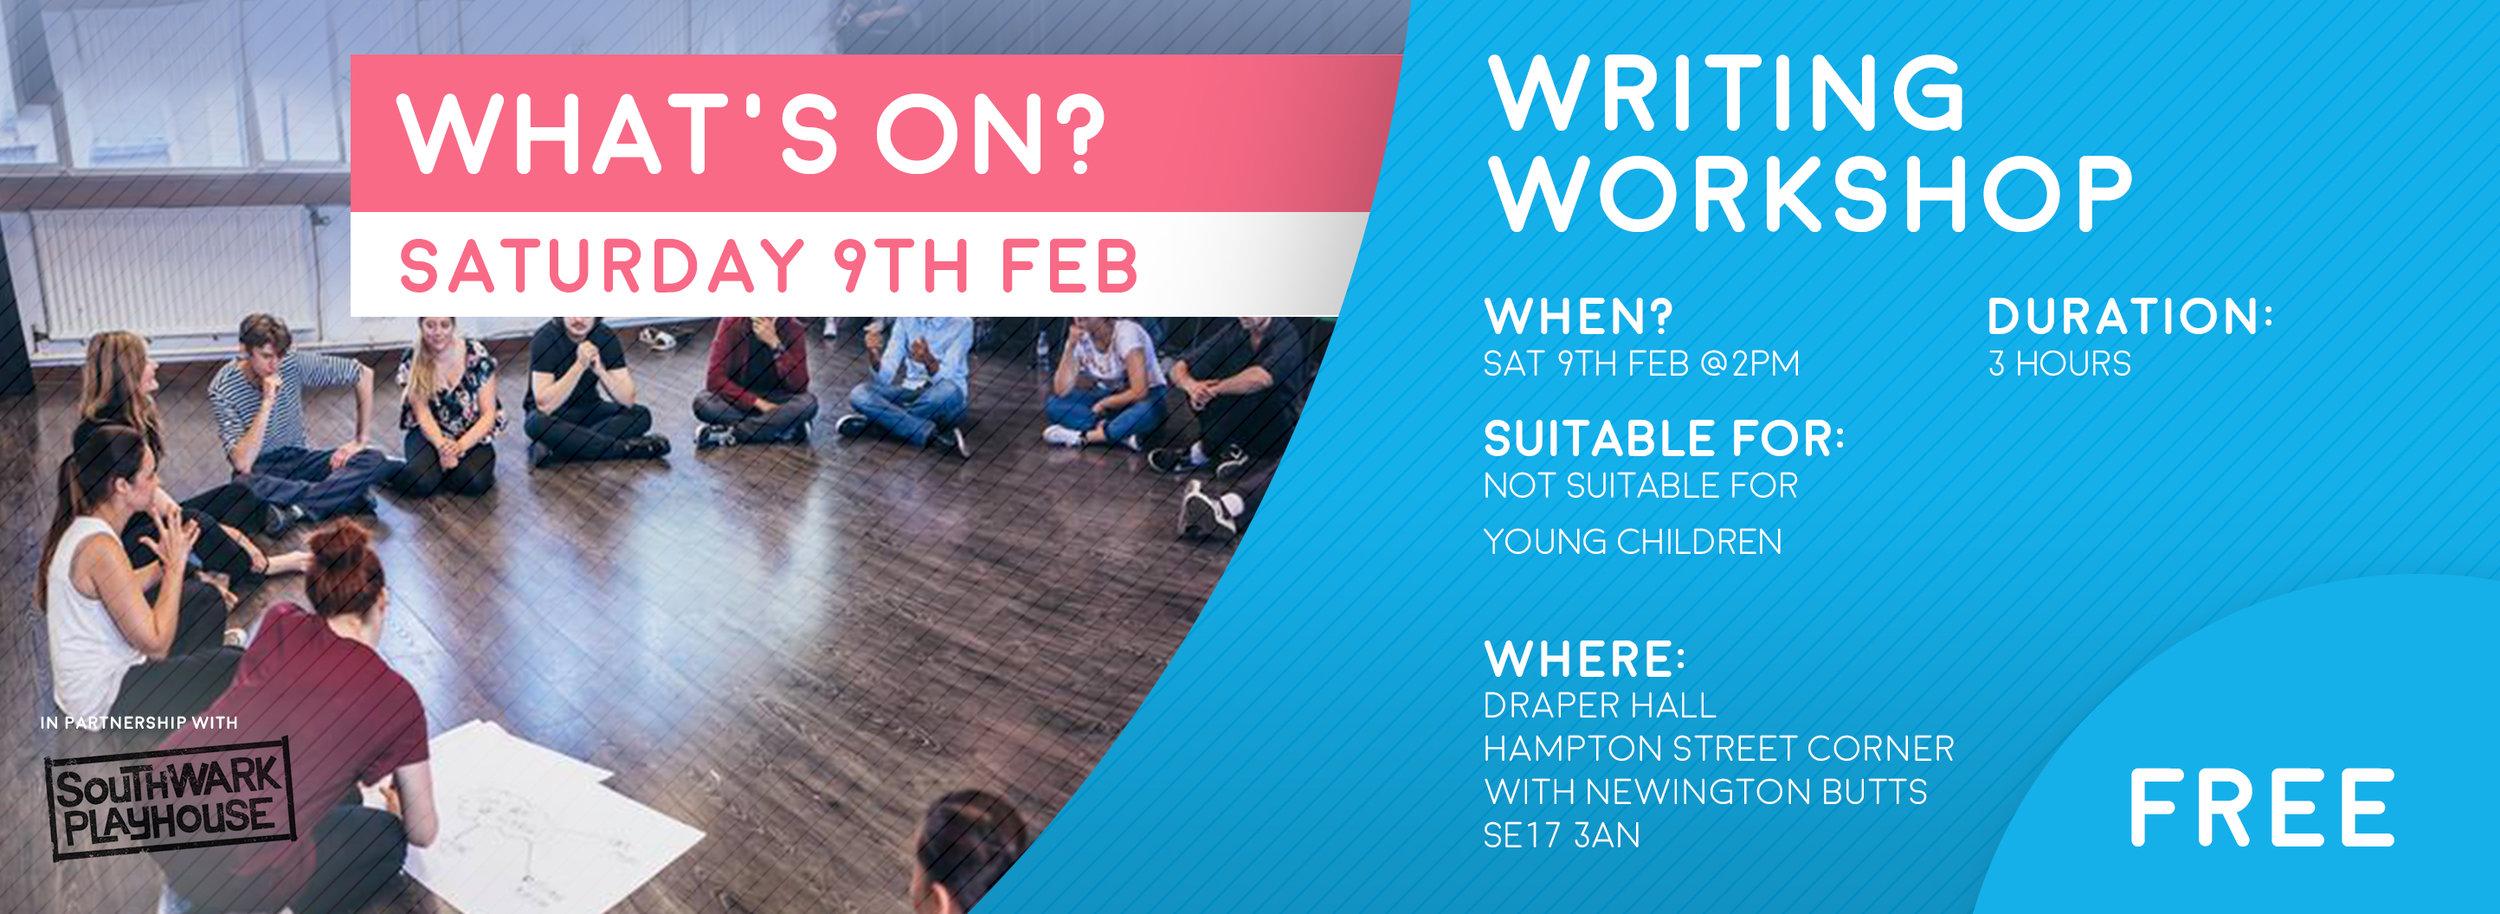 WritingWorkshop_EventInfo.jpg